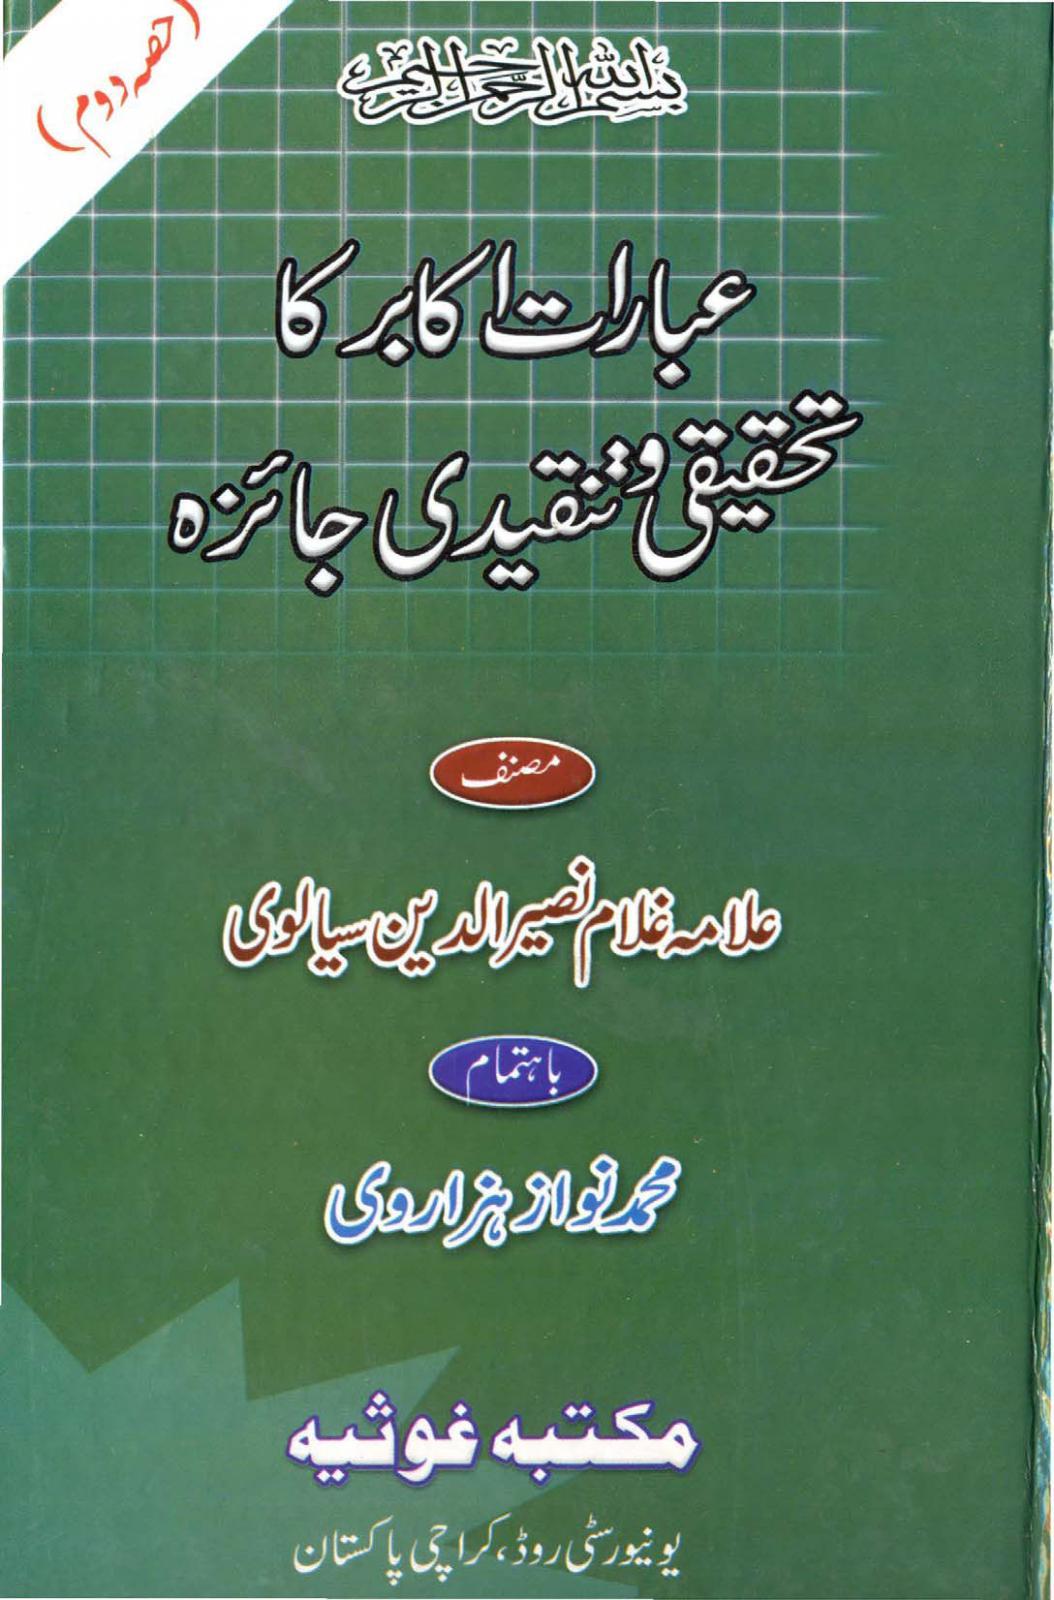 Mufti Naseer FML 1.jpg